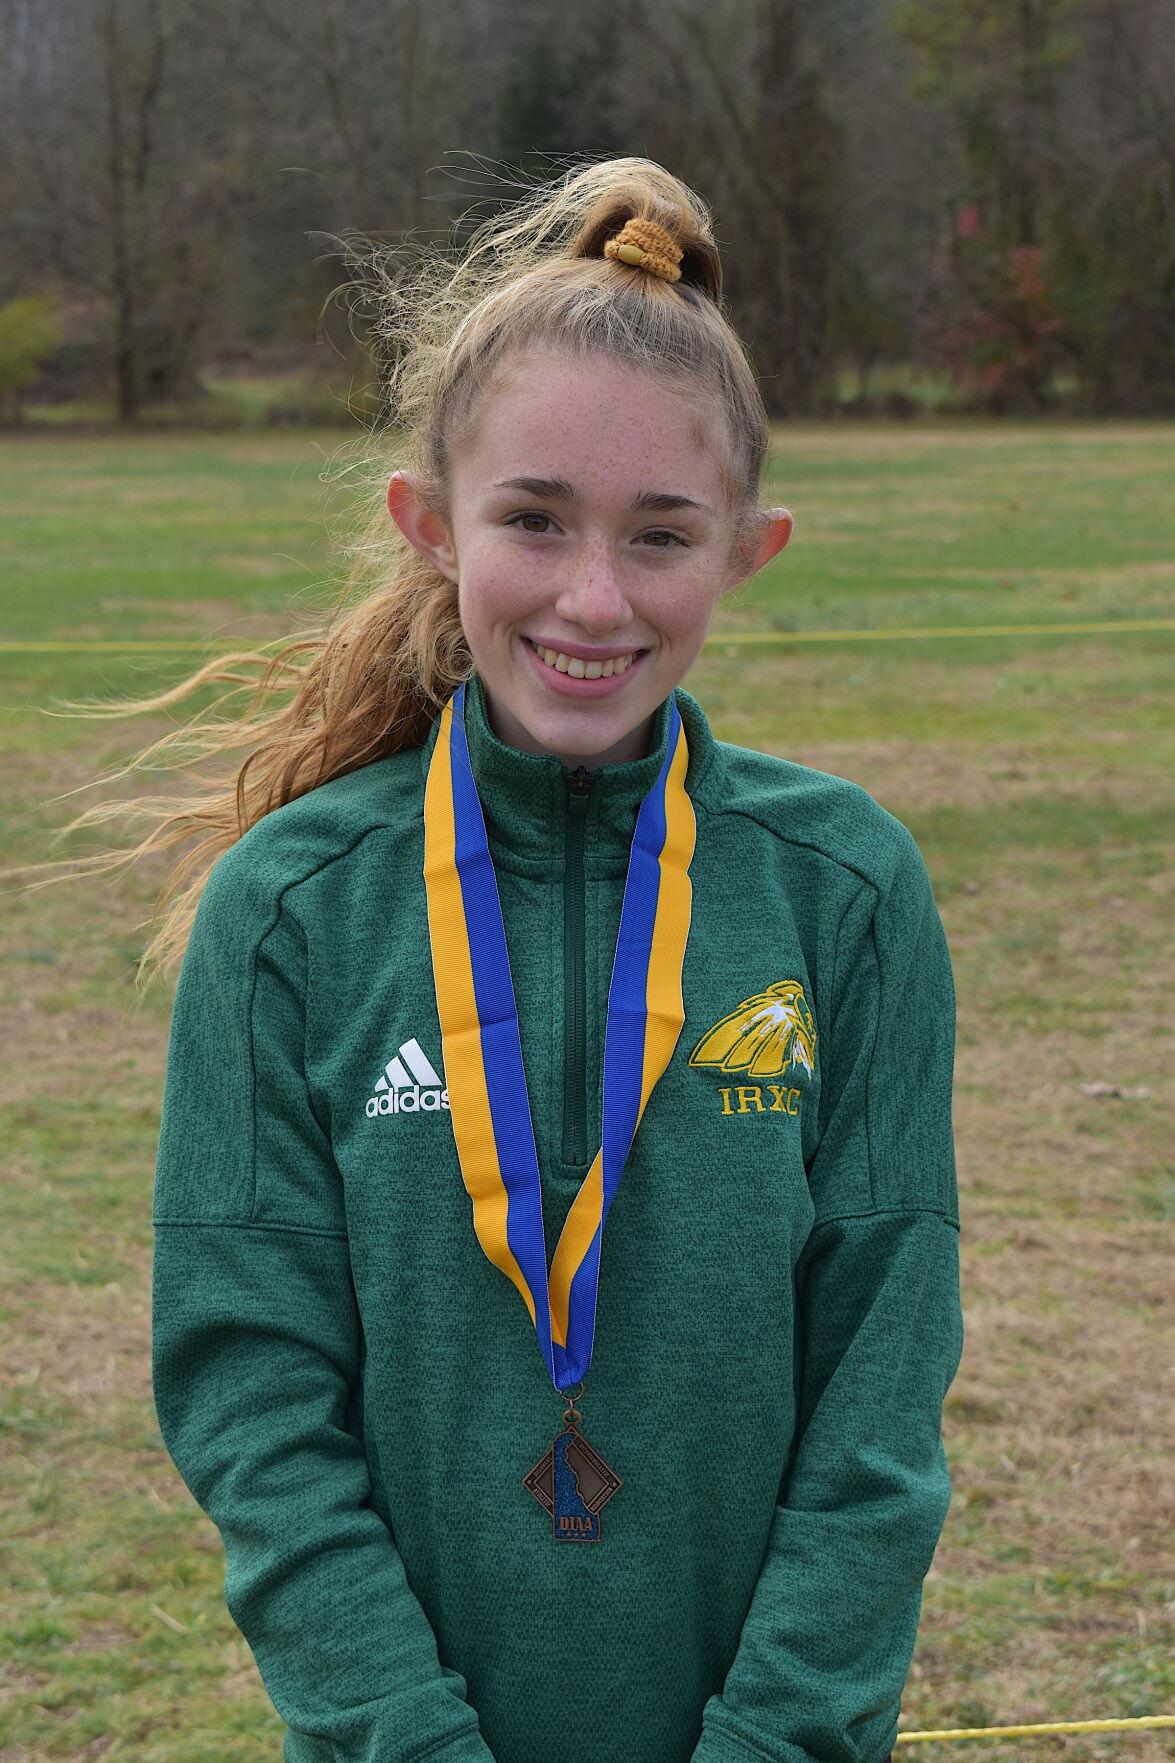 Brynn Crandell, IRHS girls' cross-country medalist (copy)